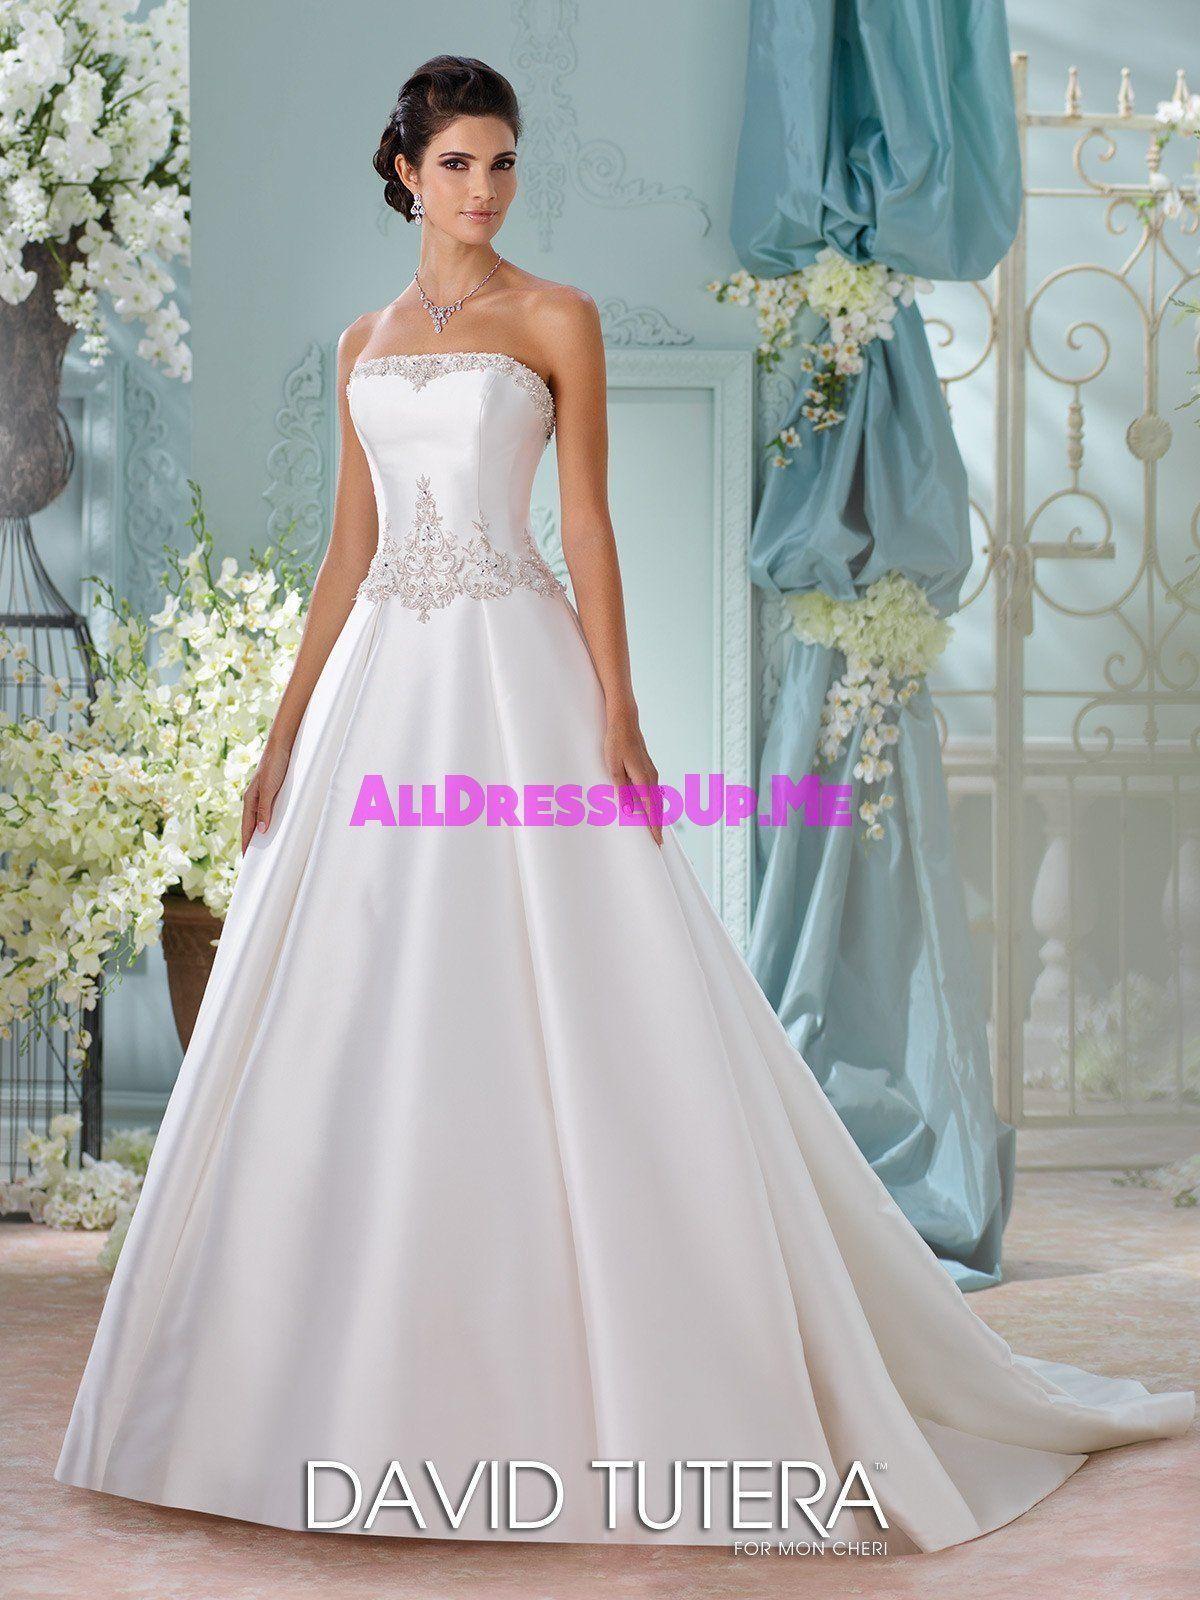 David Tutera - Selena - 116223 - All Dressed Up, Bridal Gown | David ...